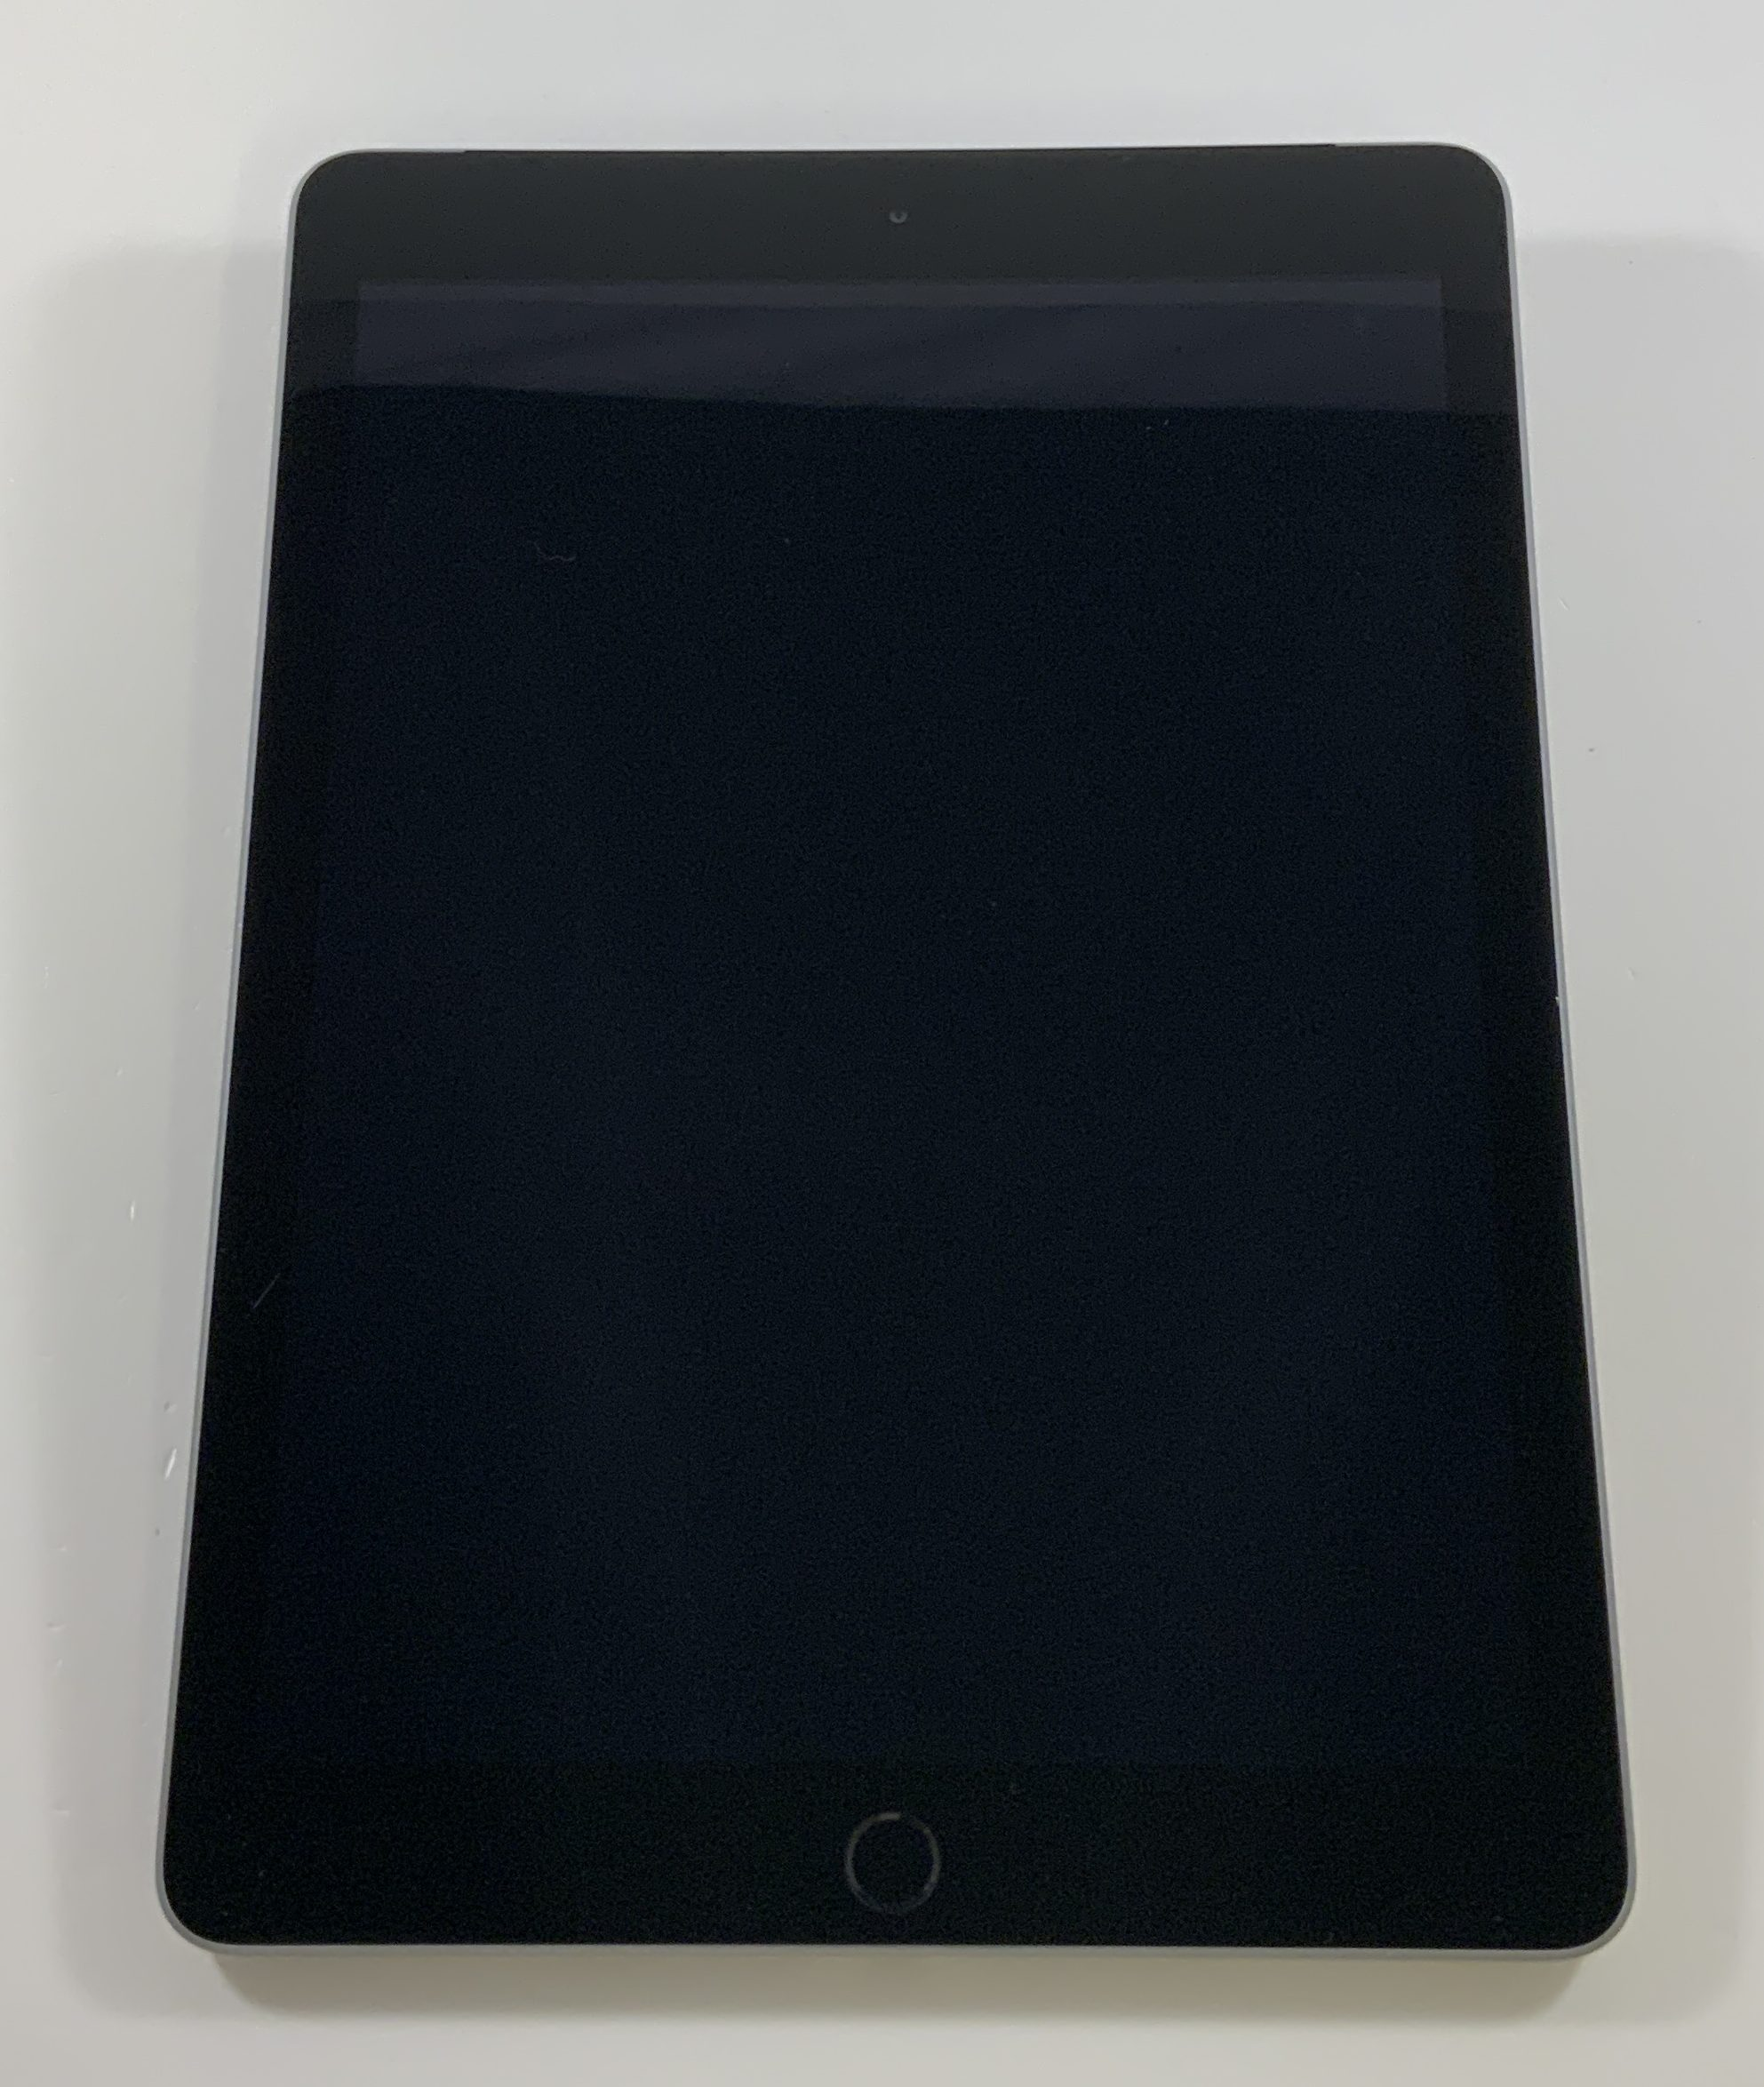 iPad 5 Wi-Fi + Cellular 128GB, 128GB, Space Gray, bild 4